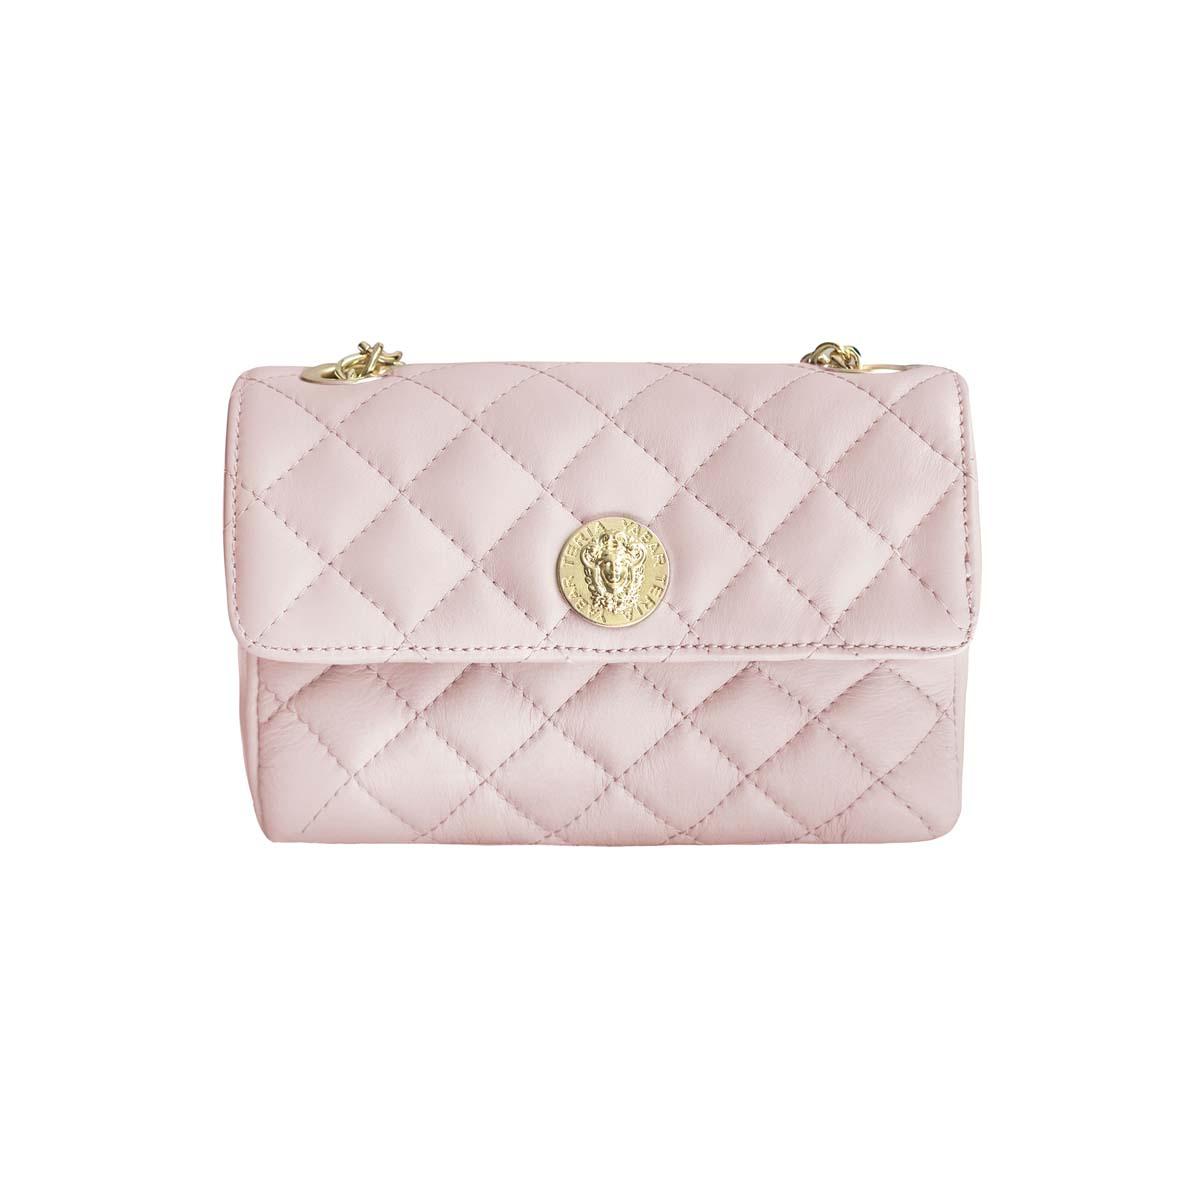 Teria Yabar - Bolso acolchado rosa